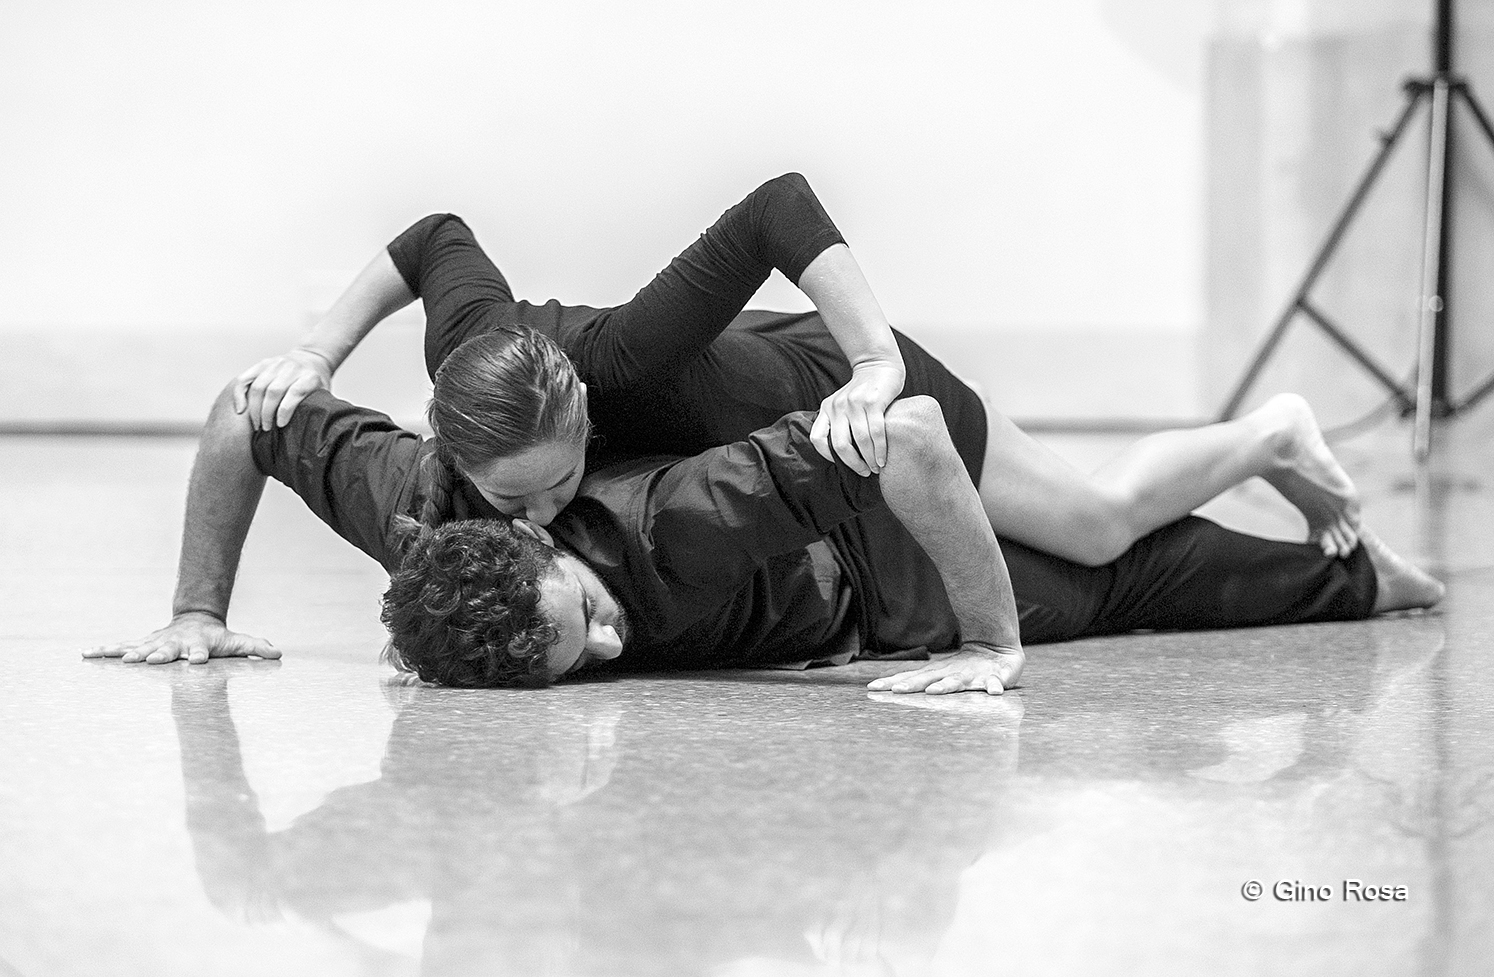 http://www.danzaurbana.eu/associazione/wp-content/uploads/2018/05/Masdanza_Mertzani_2013.jpg